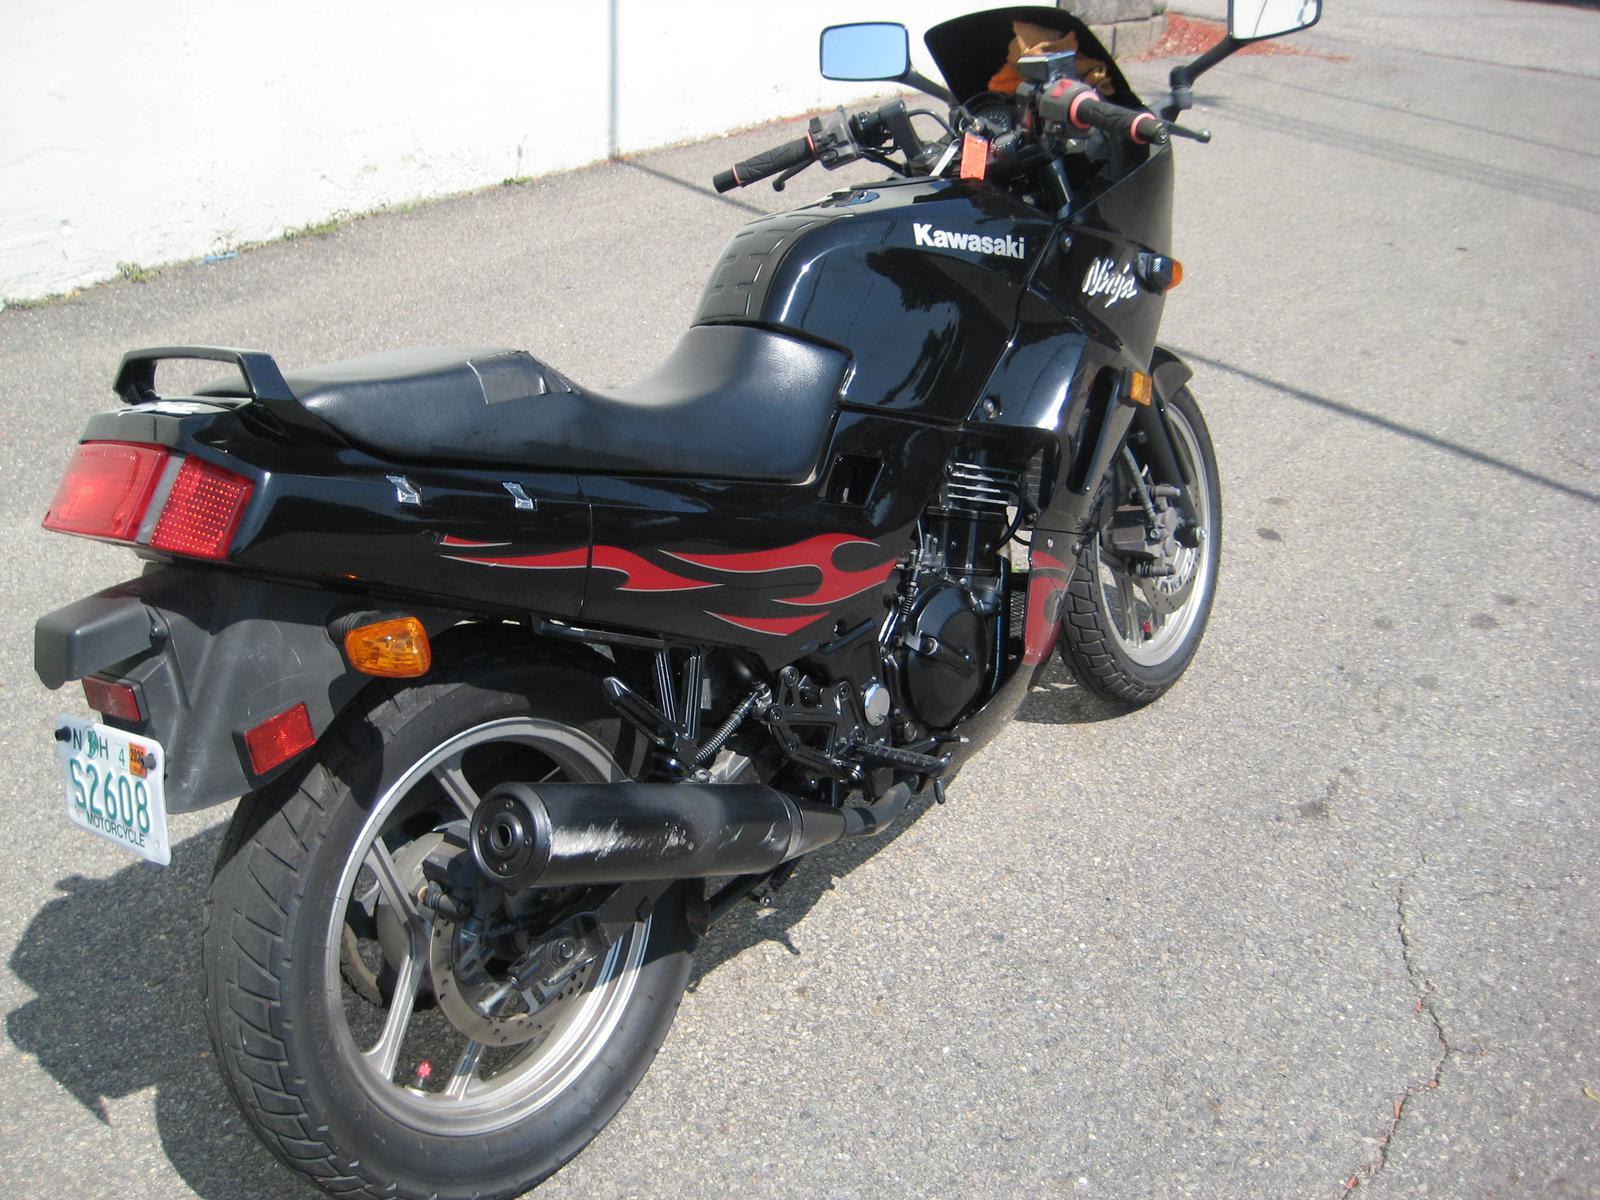 2007 Kawasaki Ninja 250r